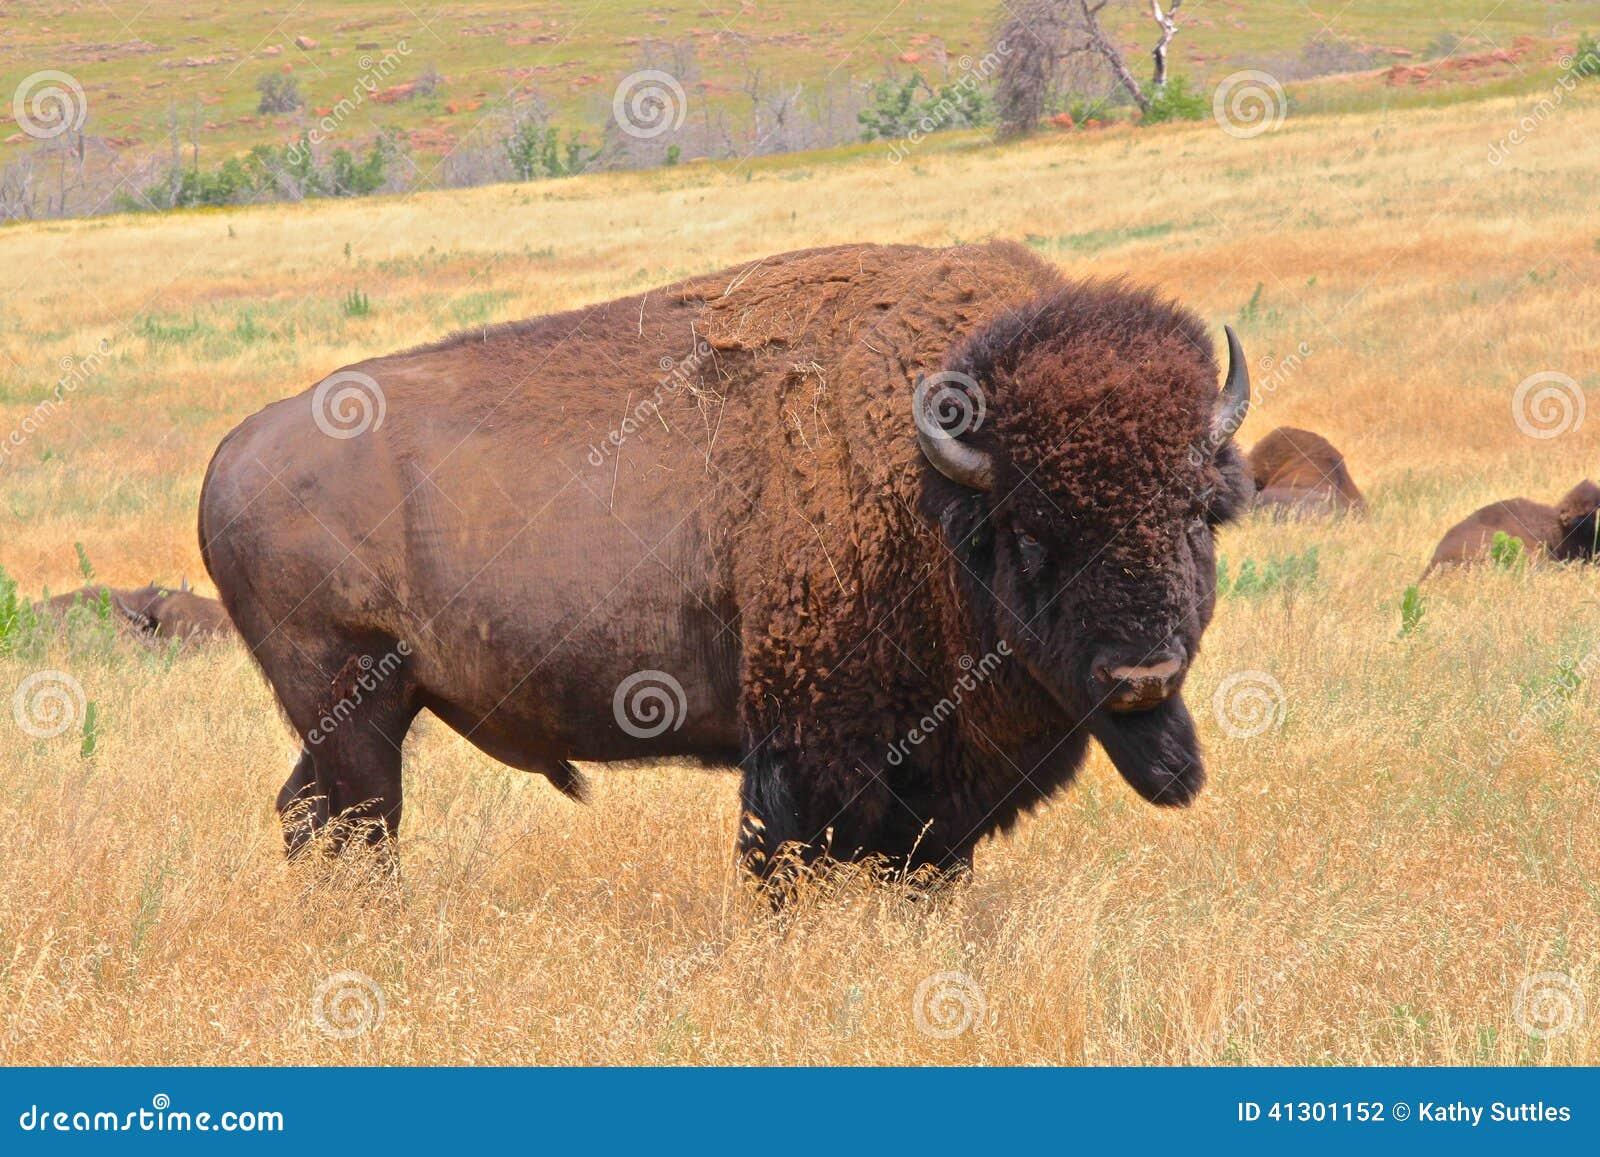 buffalo up close stock photo image 41301152. Black Bedroom Furniture Sets. Home Design Ideas